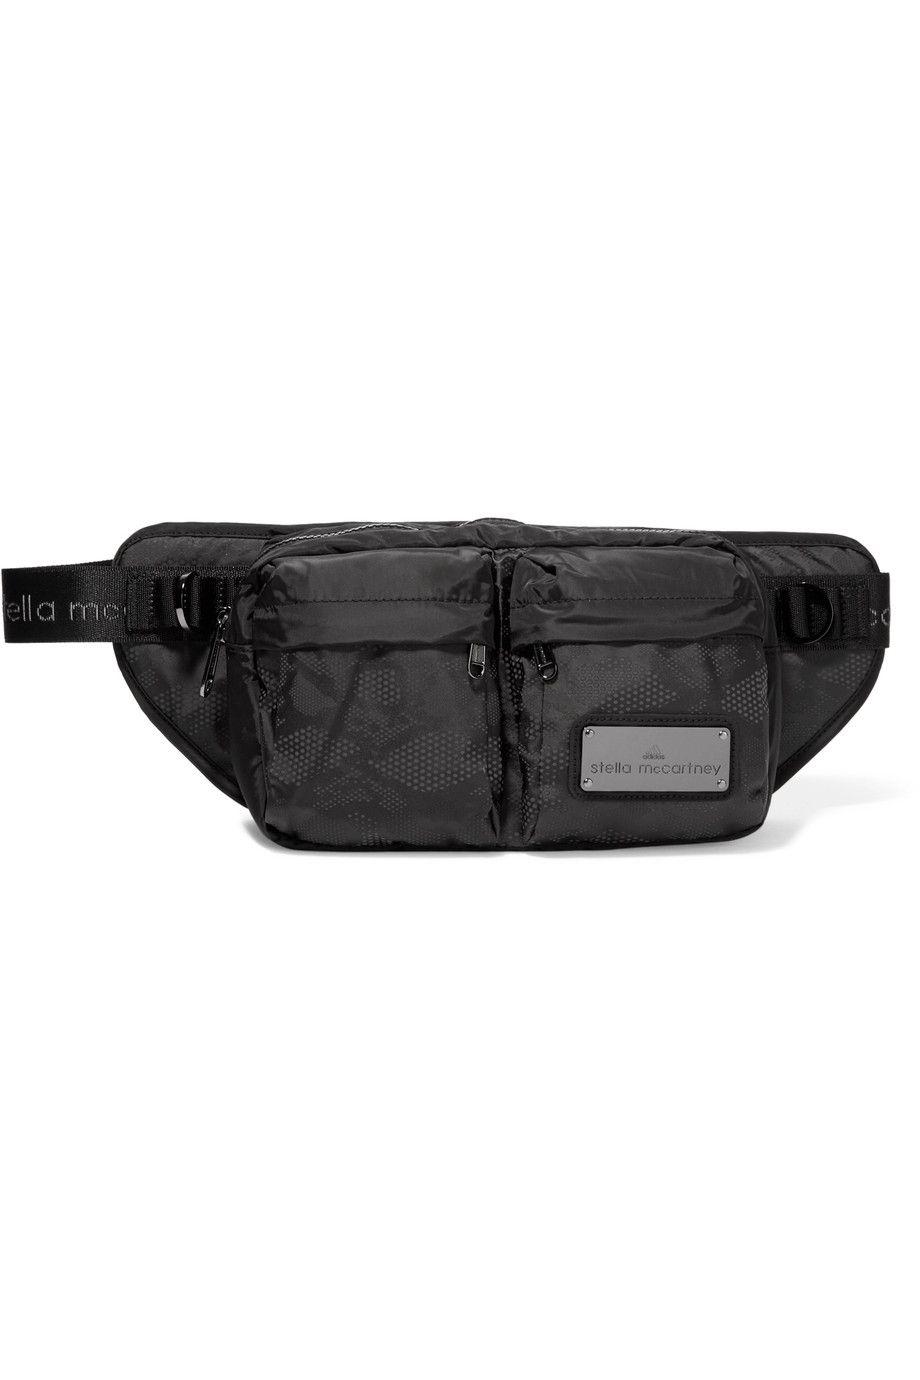 35d862974e ADIDAS BY STELLA MCCARTNEY Printed shell belt bag.  adidasbystellamccartney   bags  belt bags